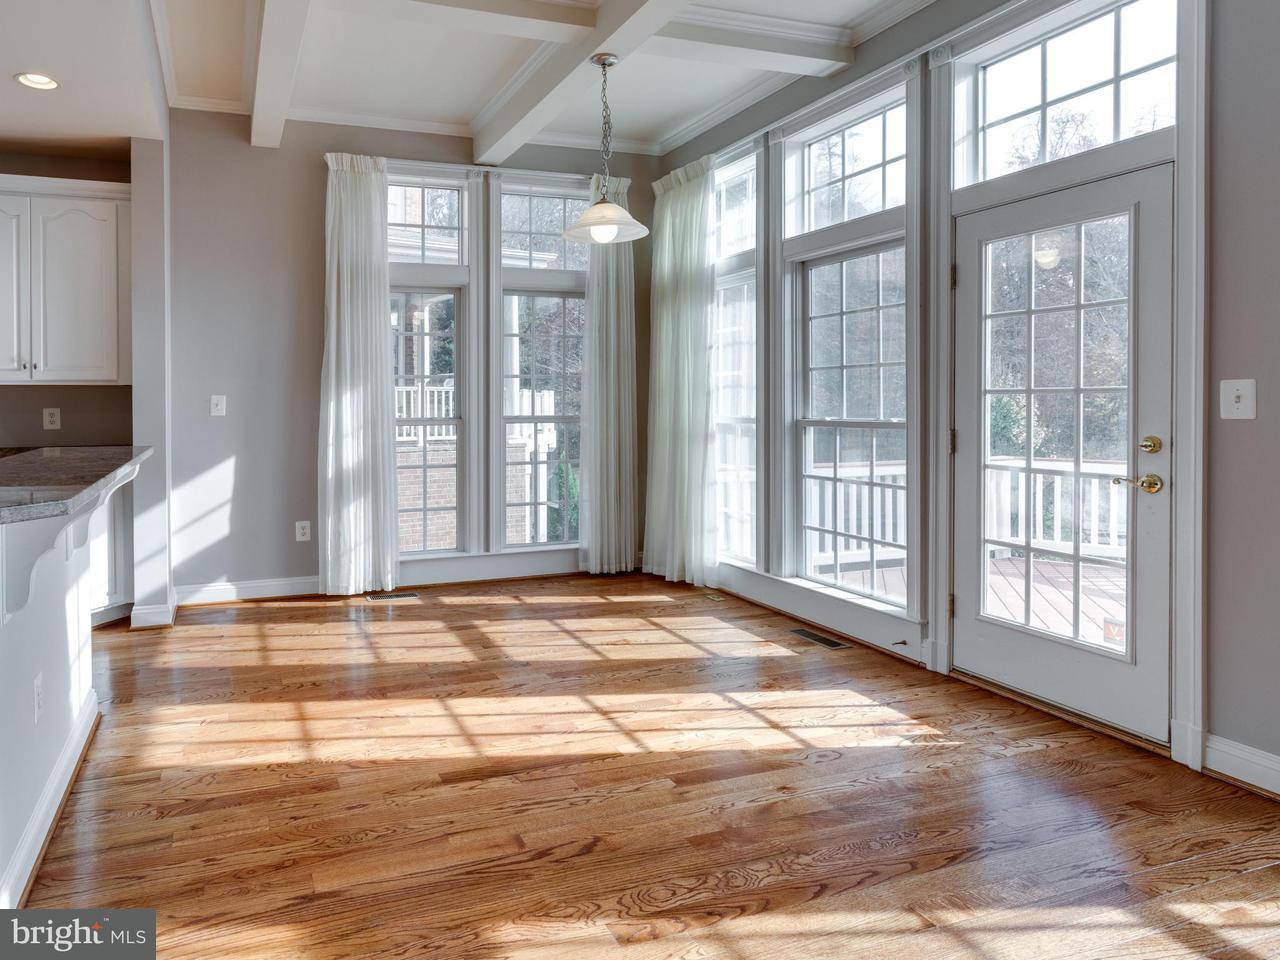 Additional photo for property listing at 3522 Schuerman House Drive 3522 Schuerman House Drive Fairfax, Virginia 22031 Stati Uniti